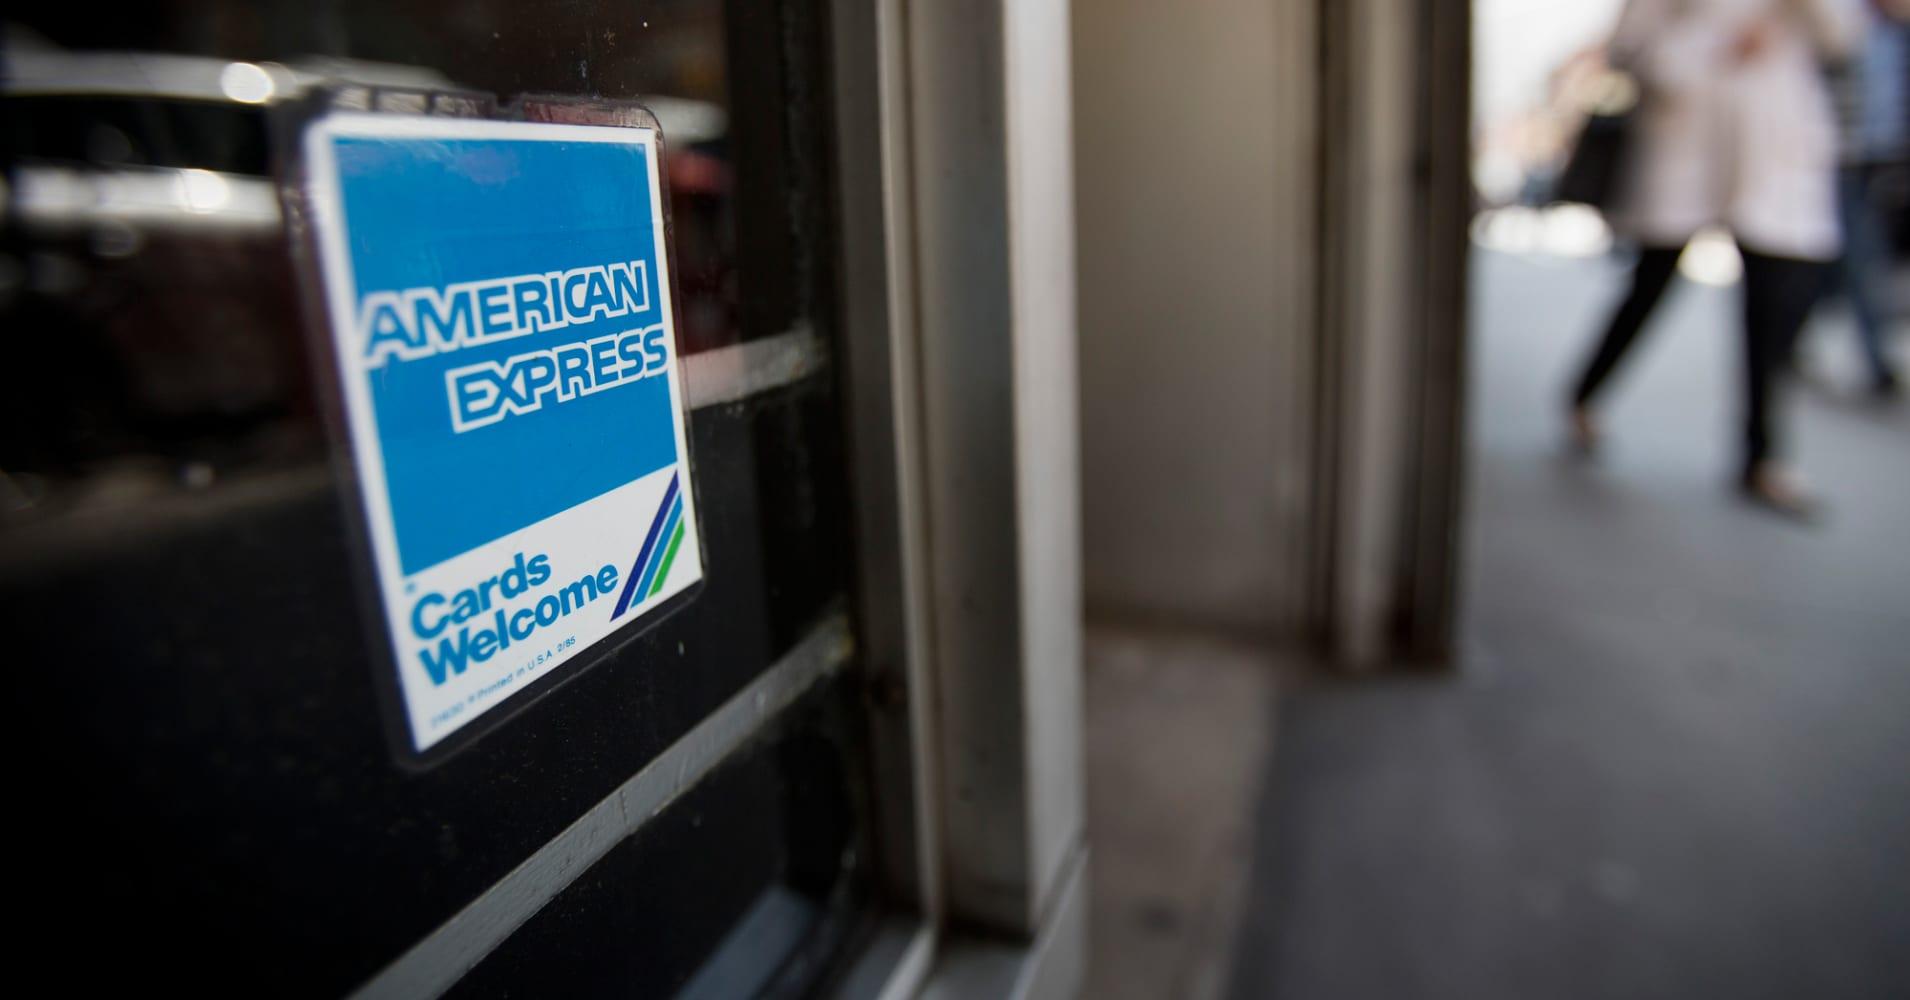 royal bank express application sign in